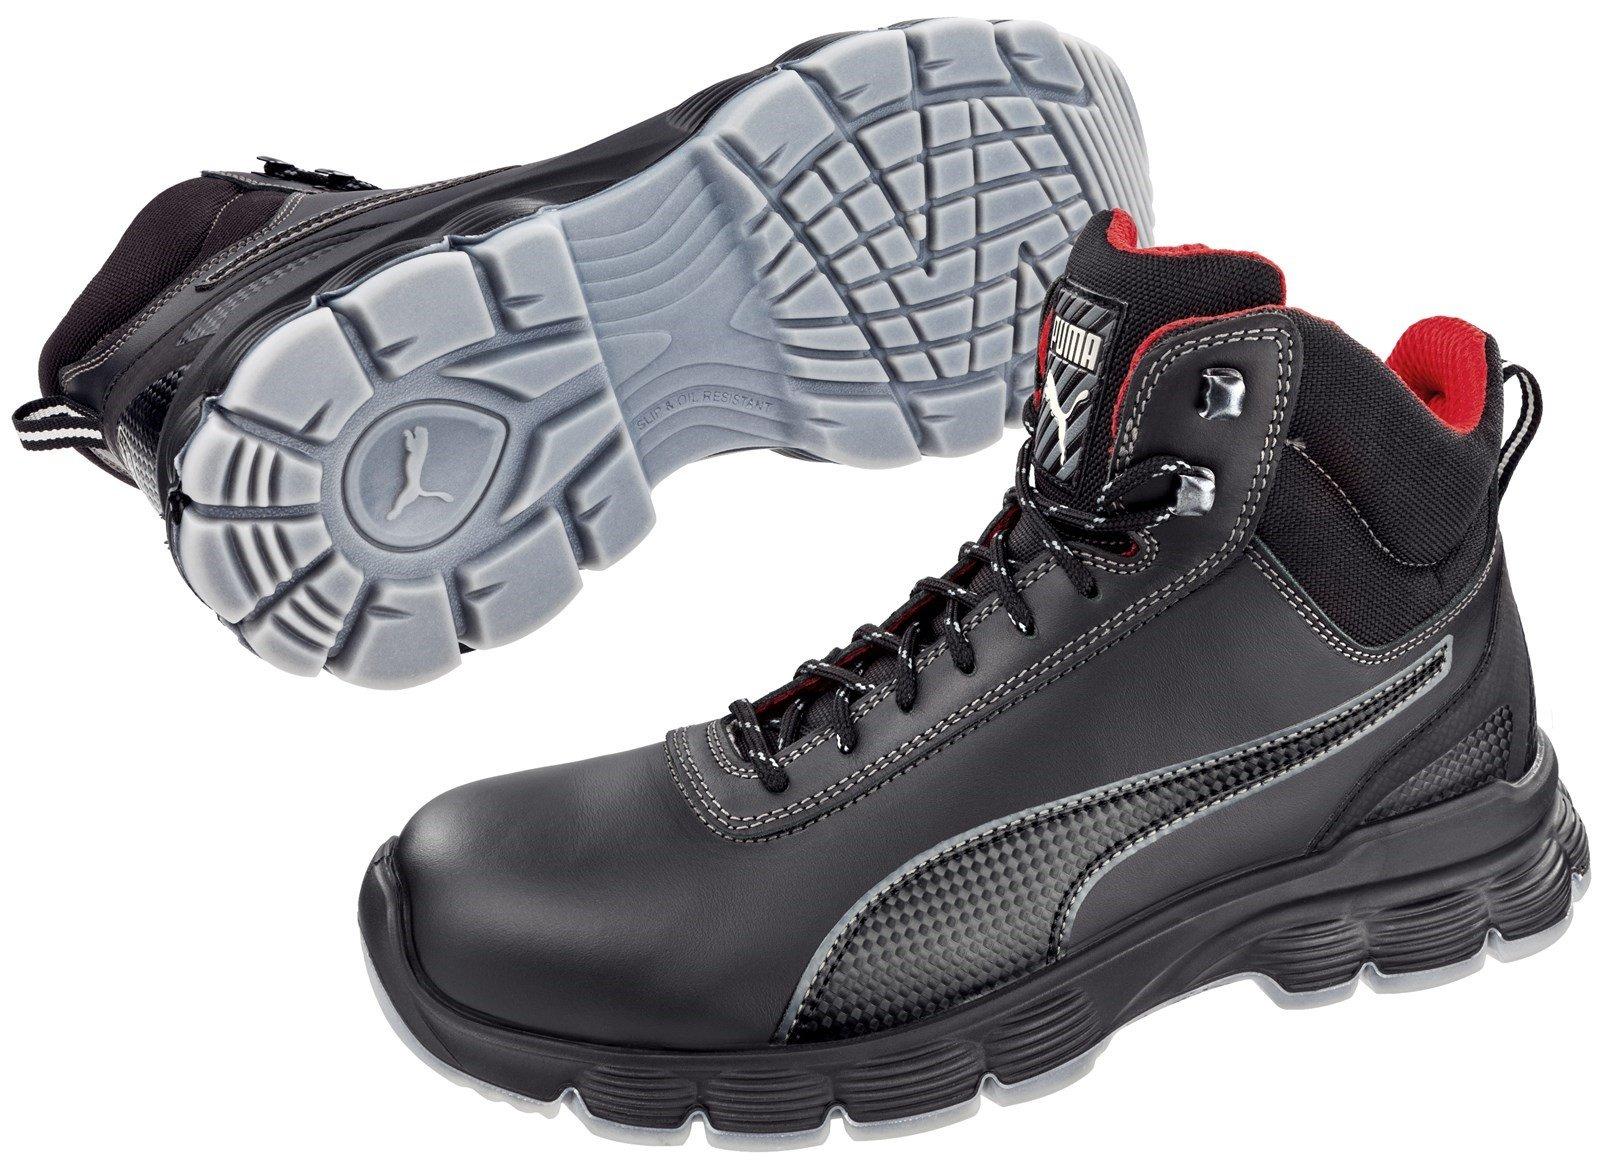 Puma Safety Unisex Condor Mid S3 Boot Black 32823 - Black 7